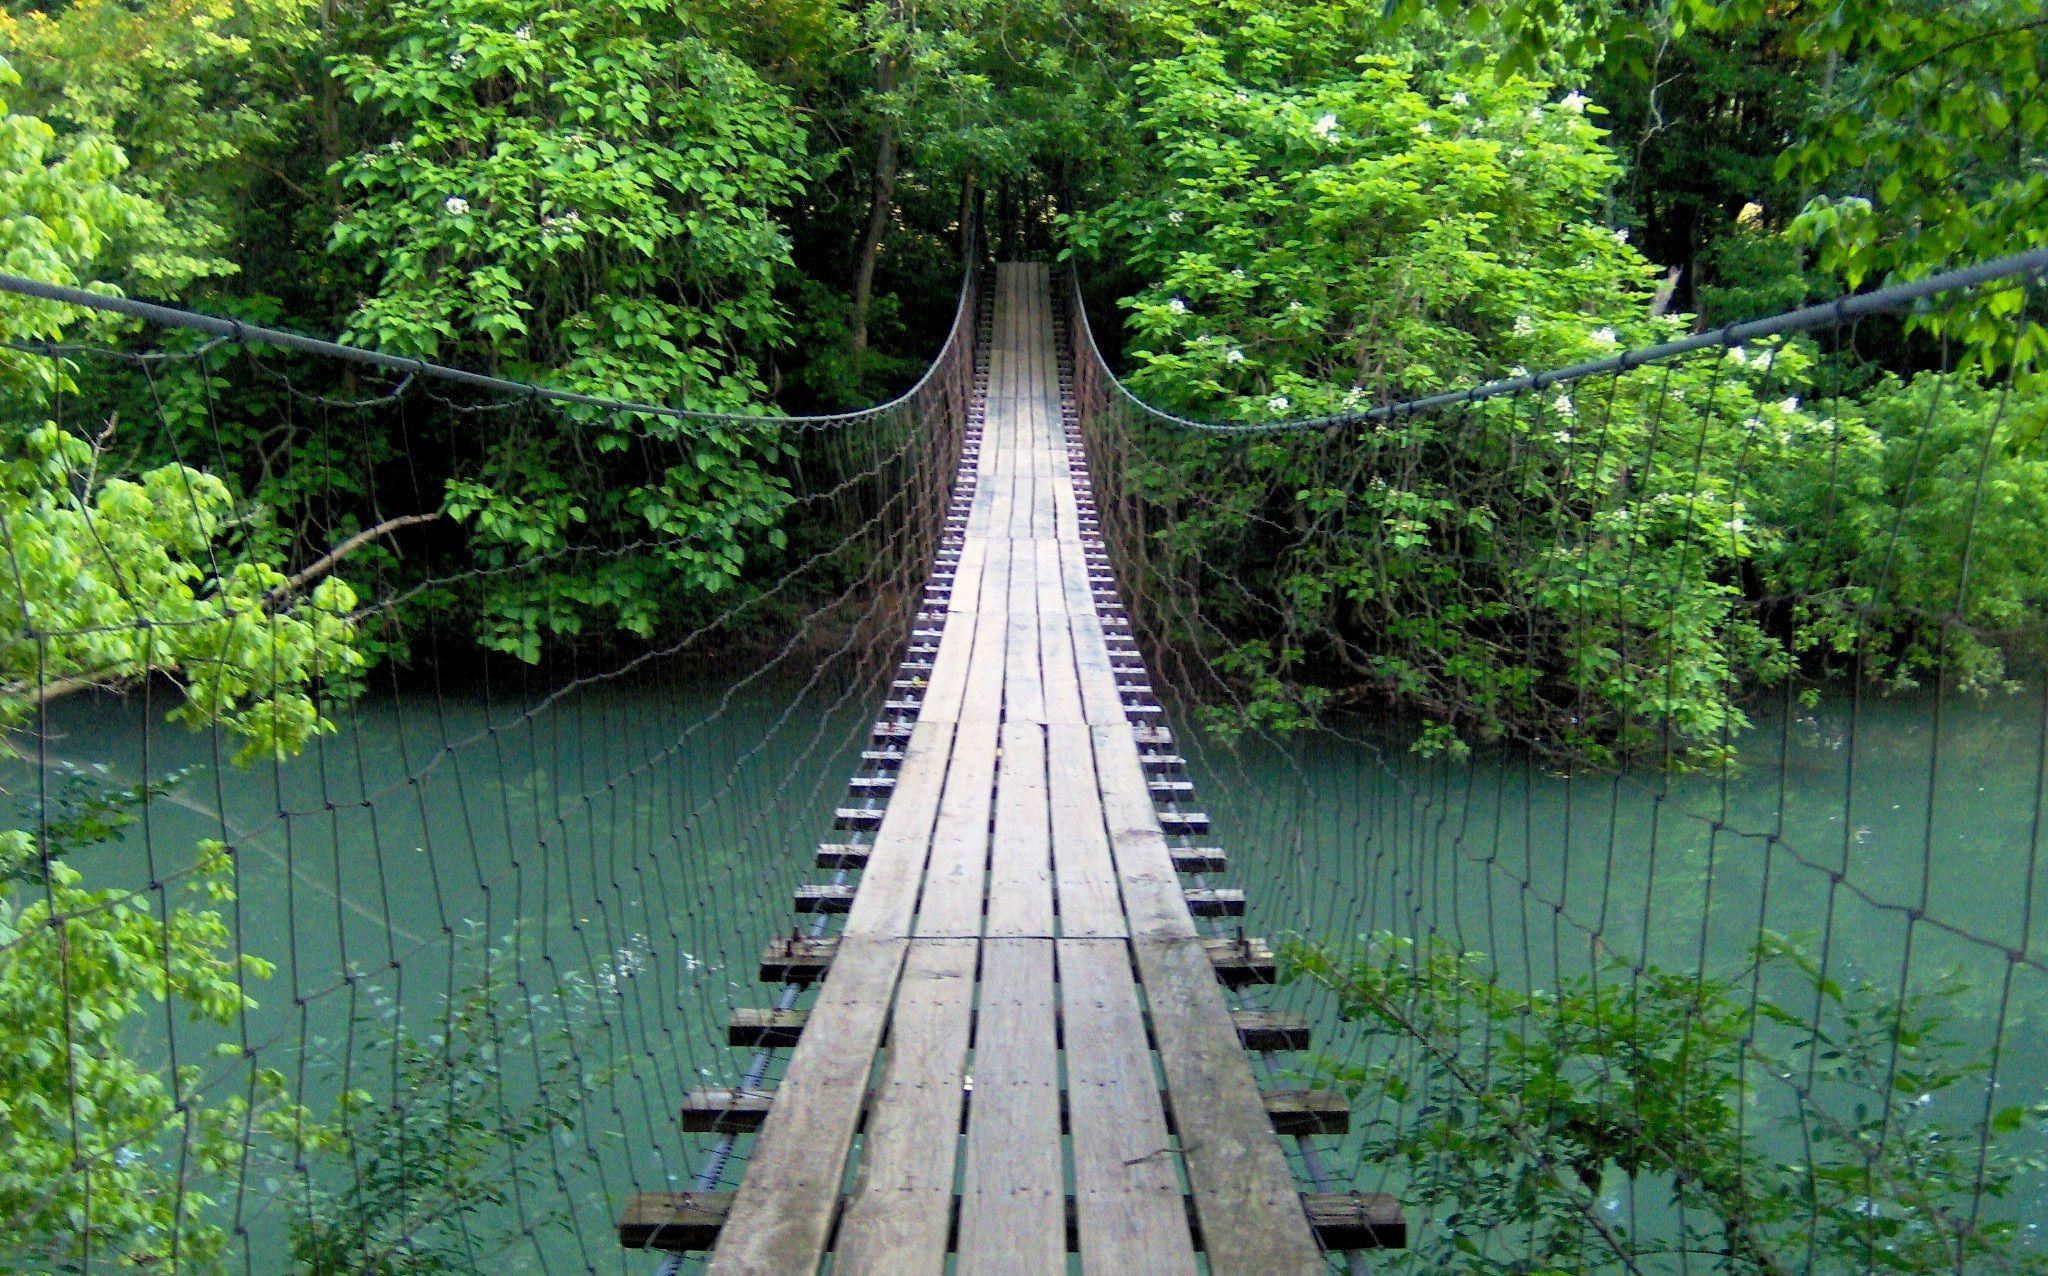 Bigs reccomend Swinging bridge state park